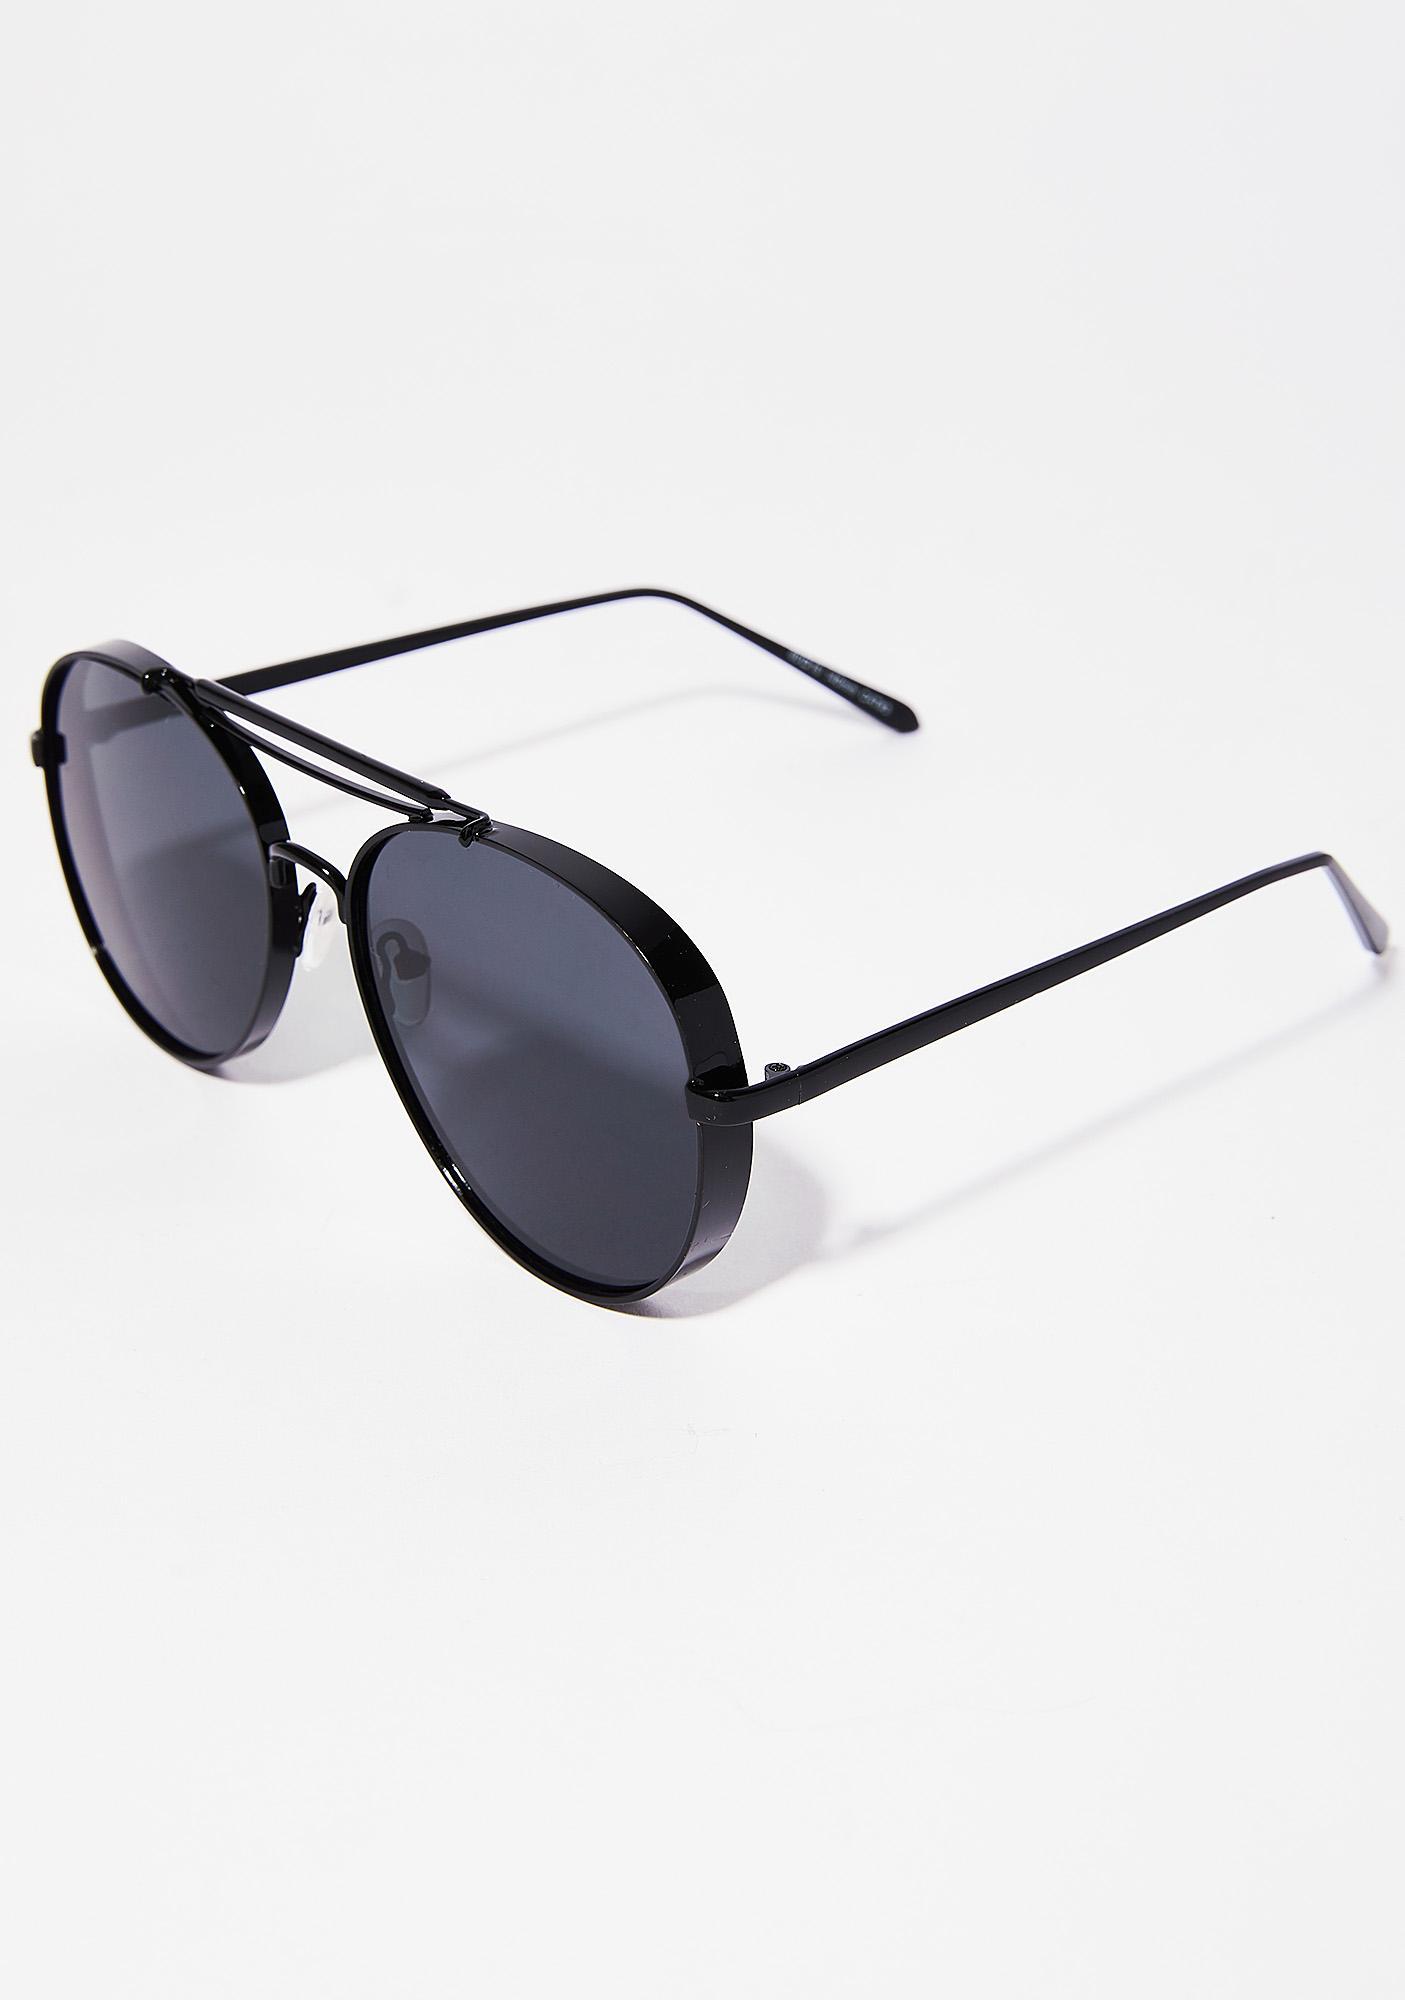 Fly Higher Aviator Sunglasses